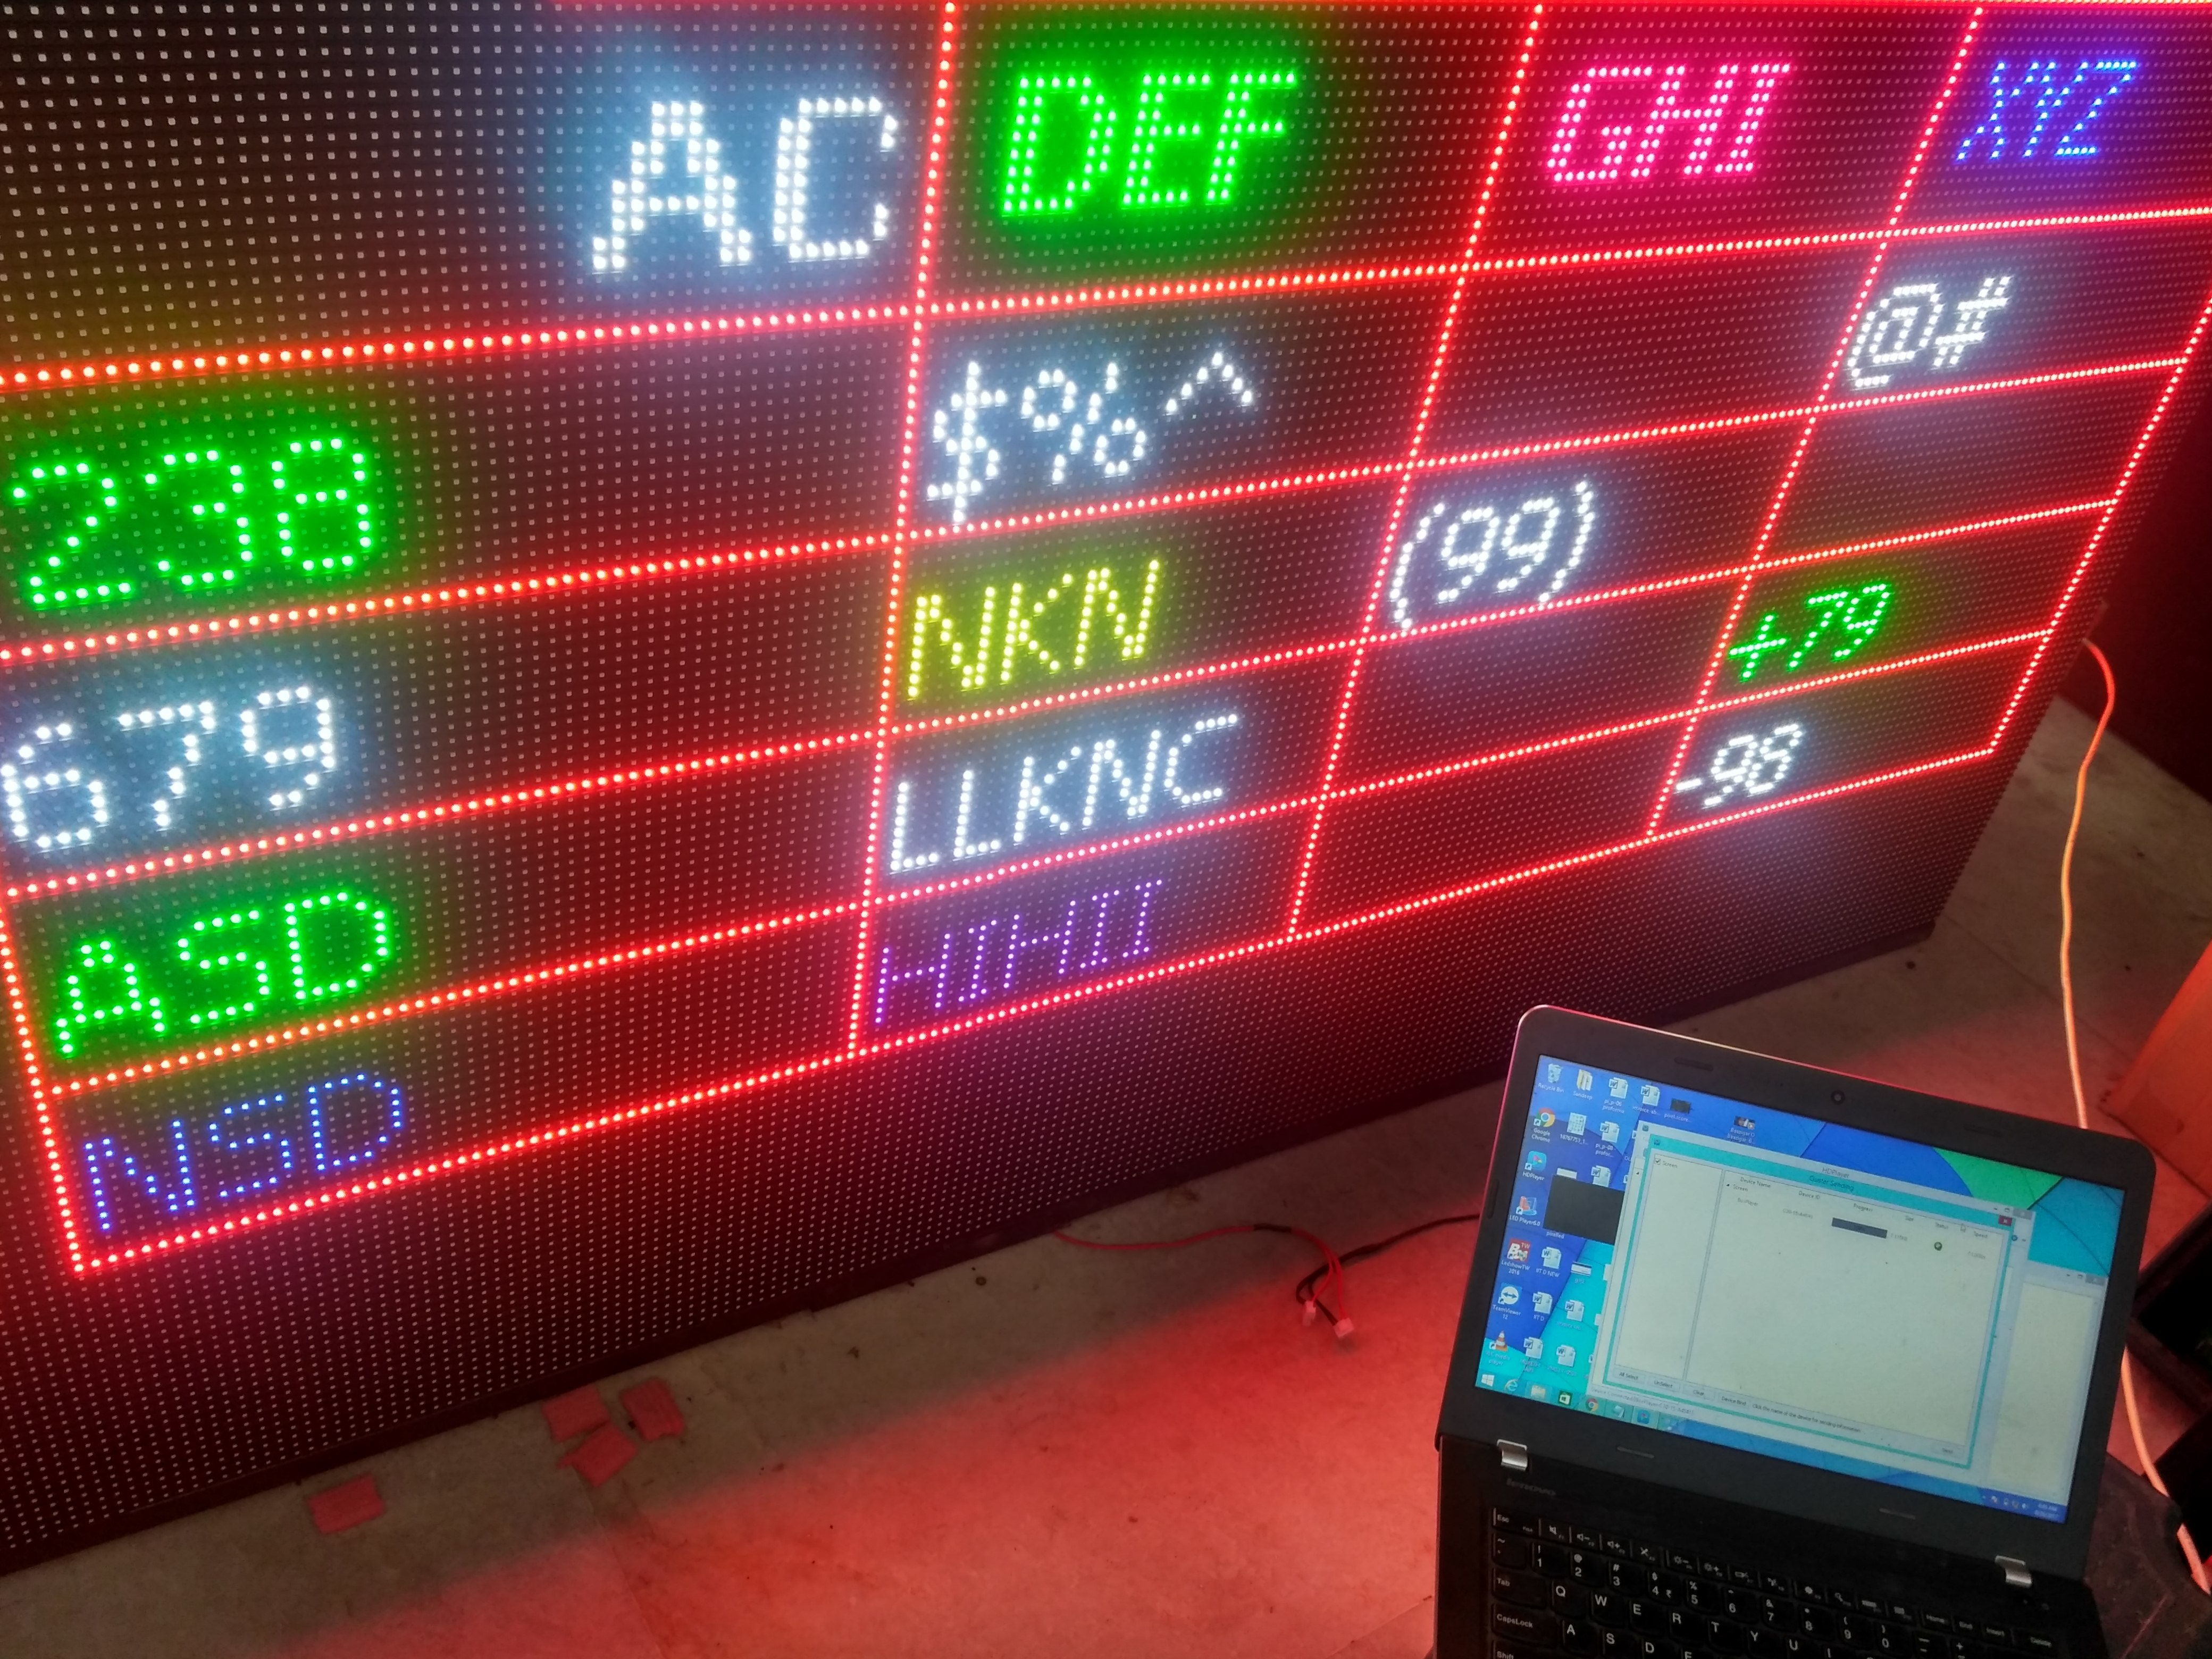 LED Ticker Display